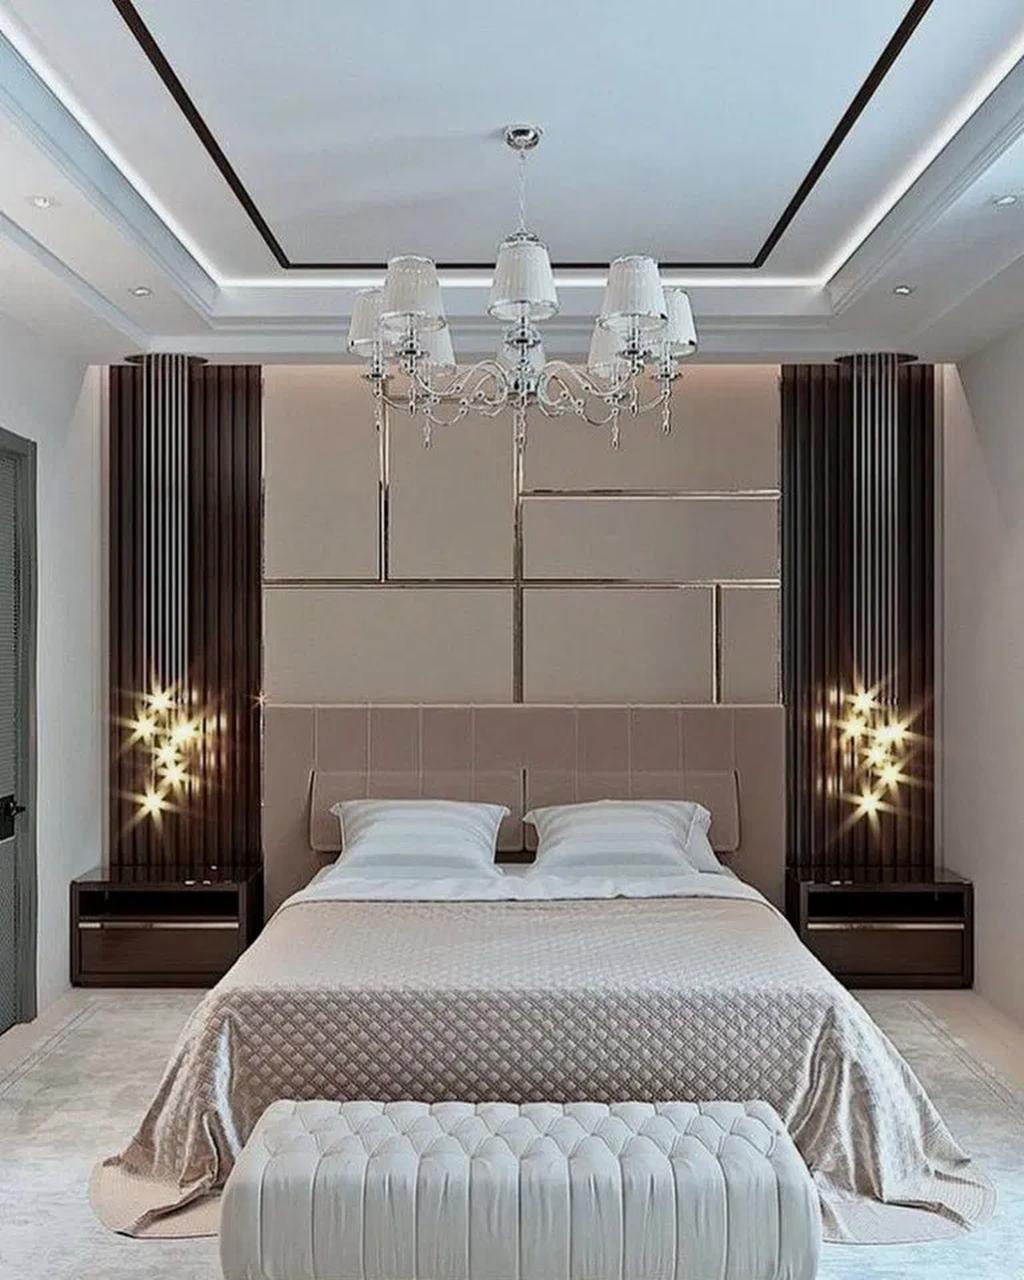 33 Popular Master Bedroom Decor Ideas In 2020 Luxury Bedroom Master Luxurious Bedrooms Luxury Bedroom Design